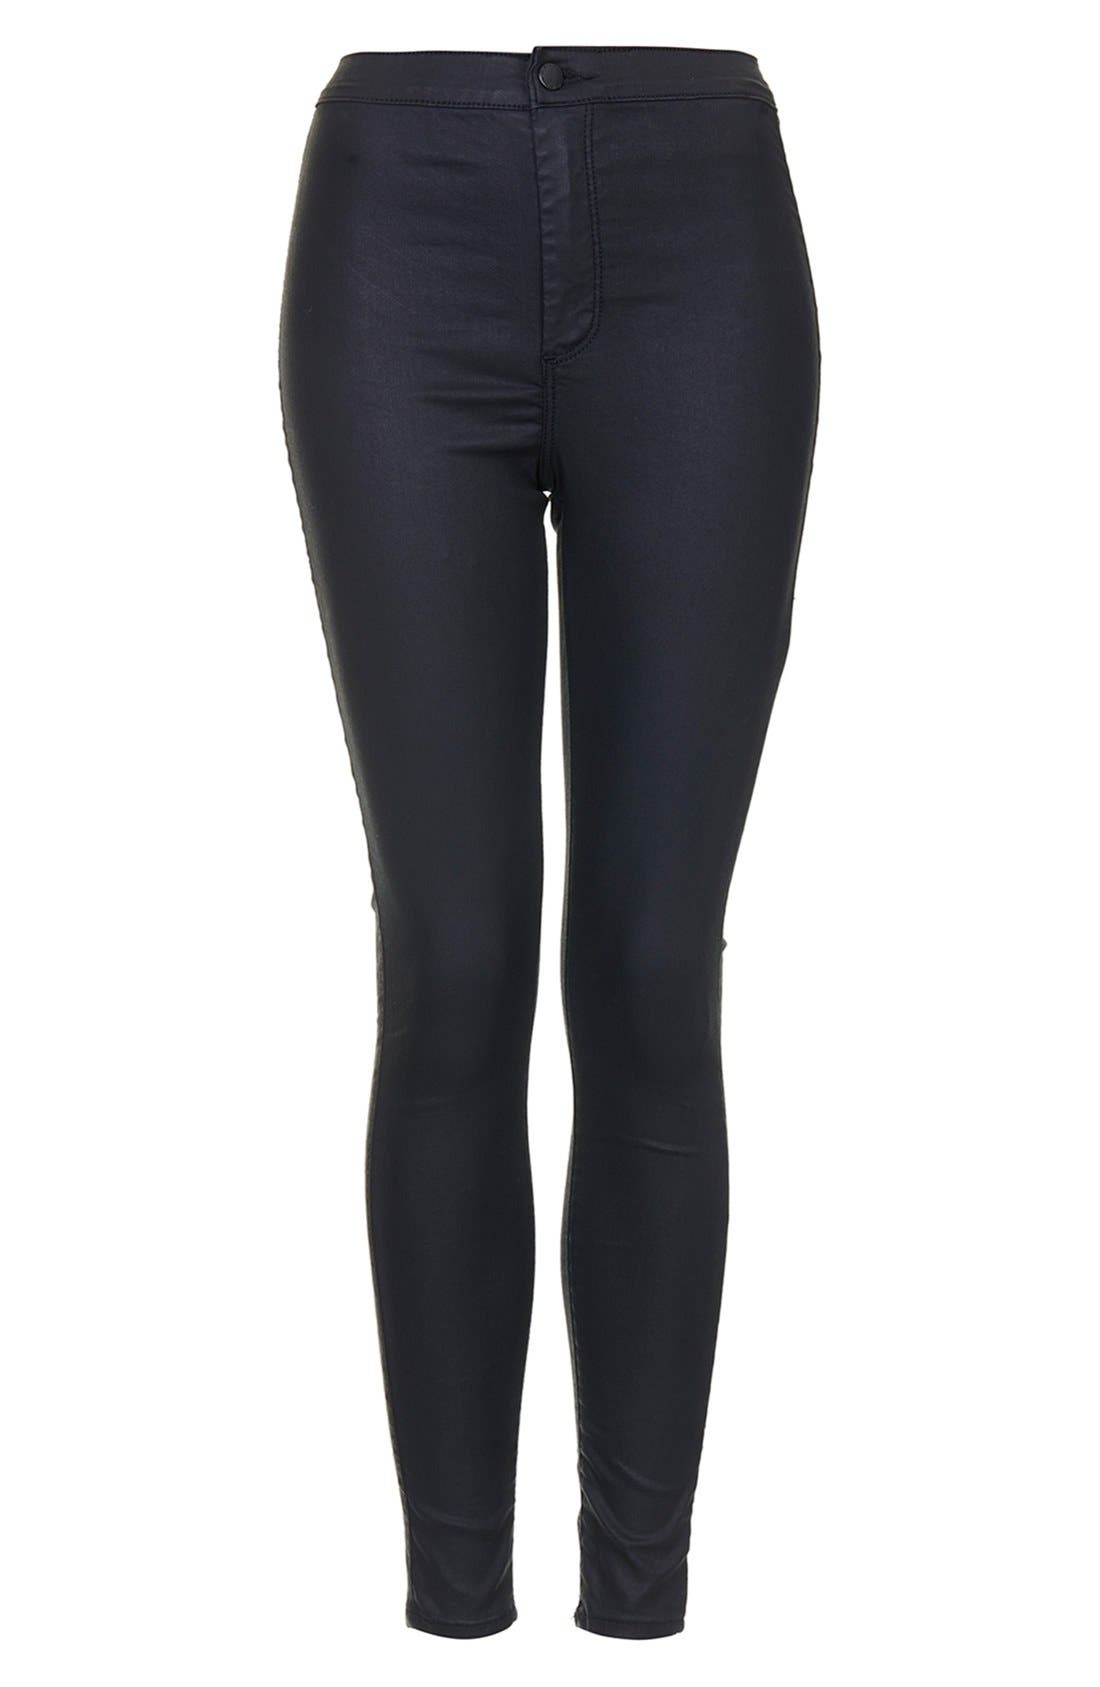 Alternate Image 3  - Topshop Moto 'Joni' Coated Skinny Jeans (Black)